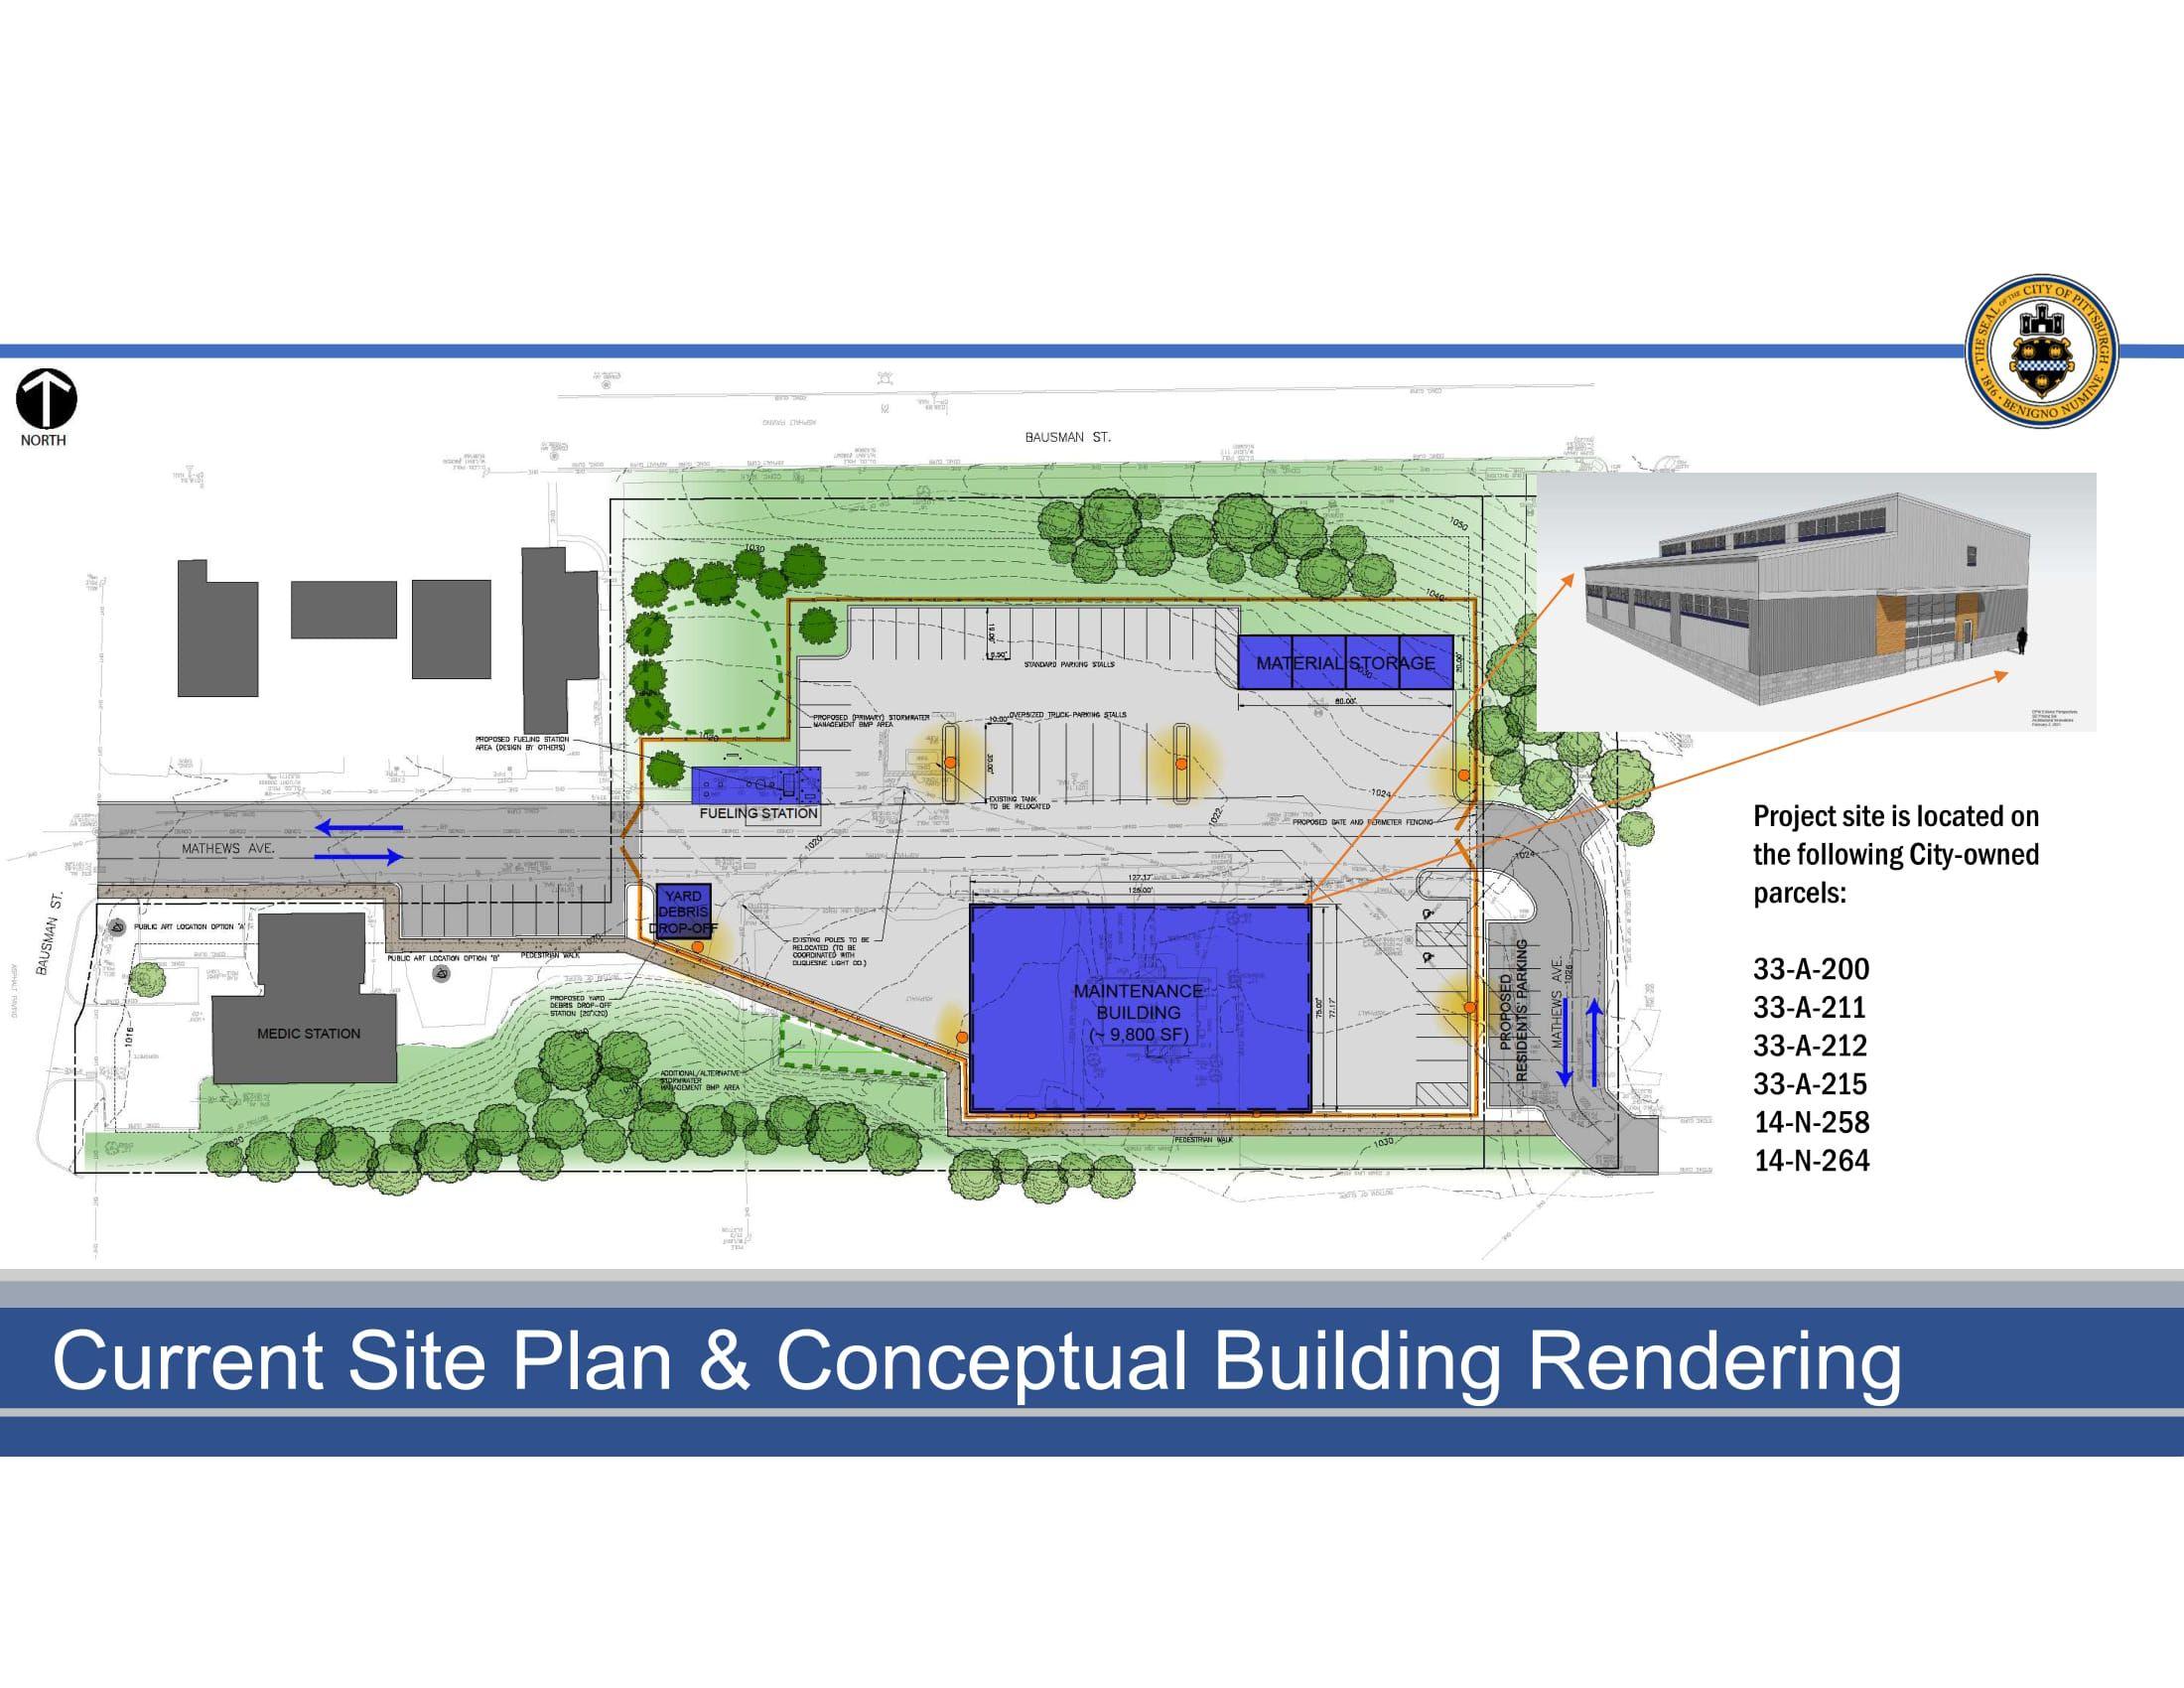 Current site plan & conceptual building rendering